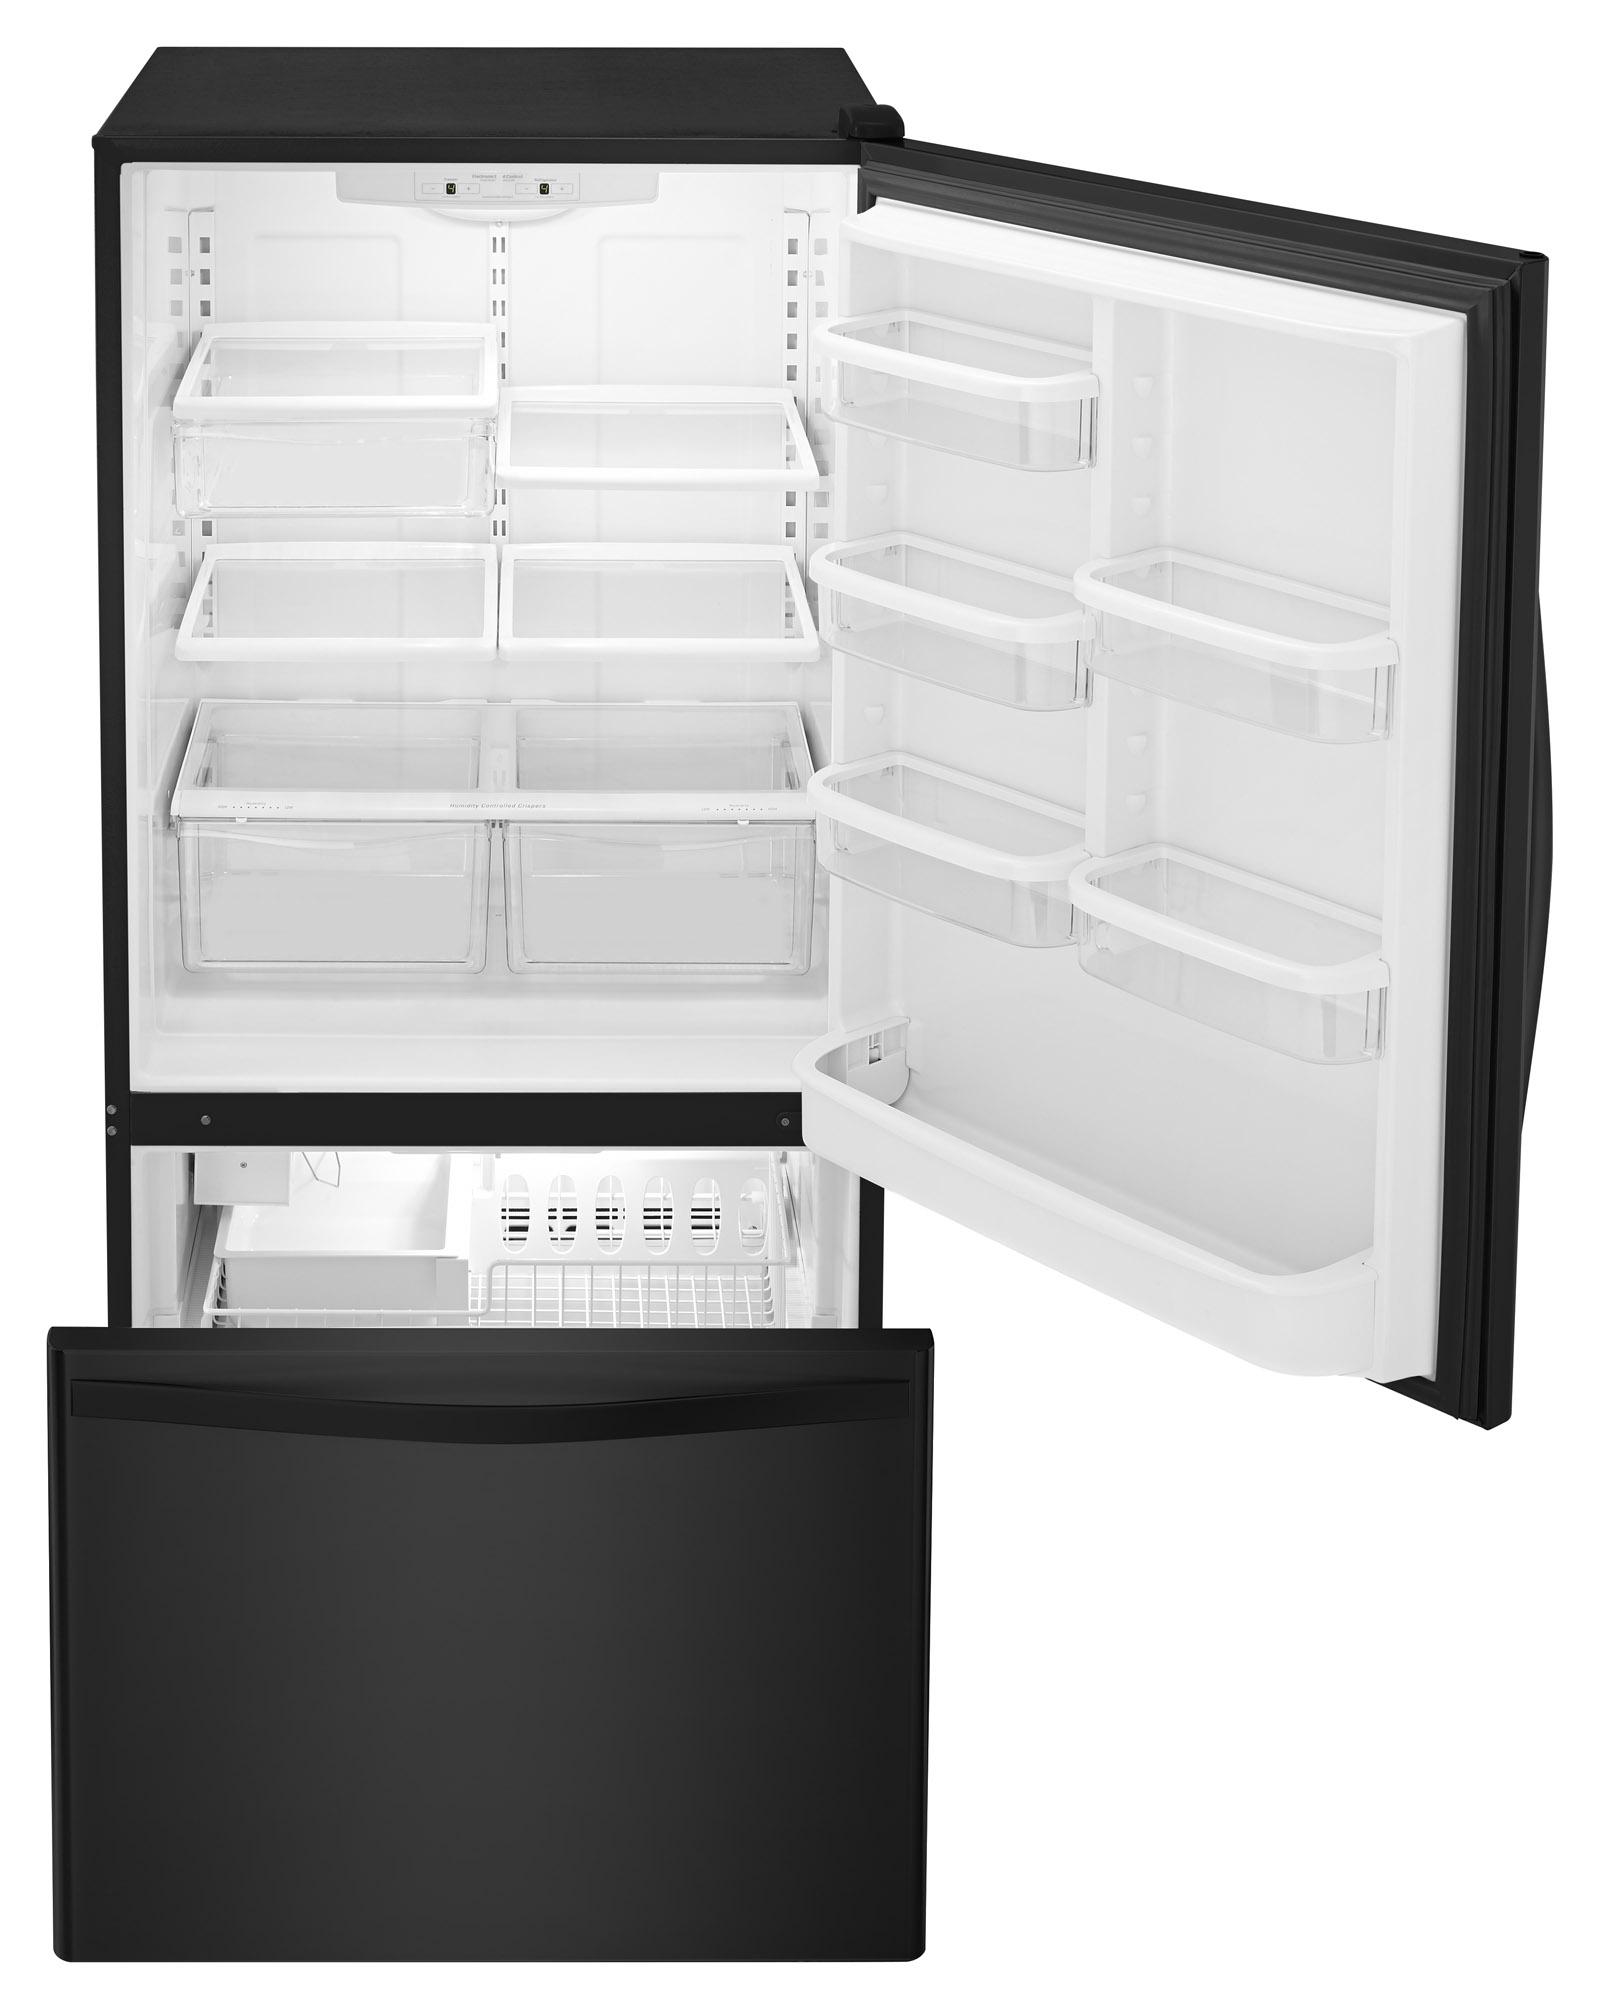 Whirlpool WRB329DMBB 19 cu. ft. Single Door Bottom Freezer Refrigerator w/ Adaptive Defrost - Black